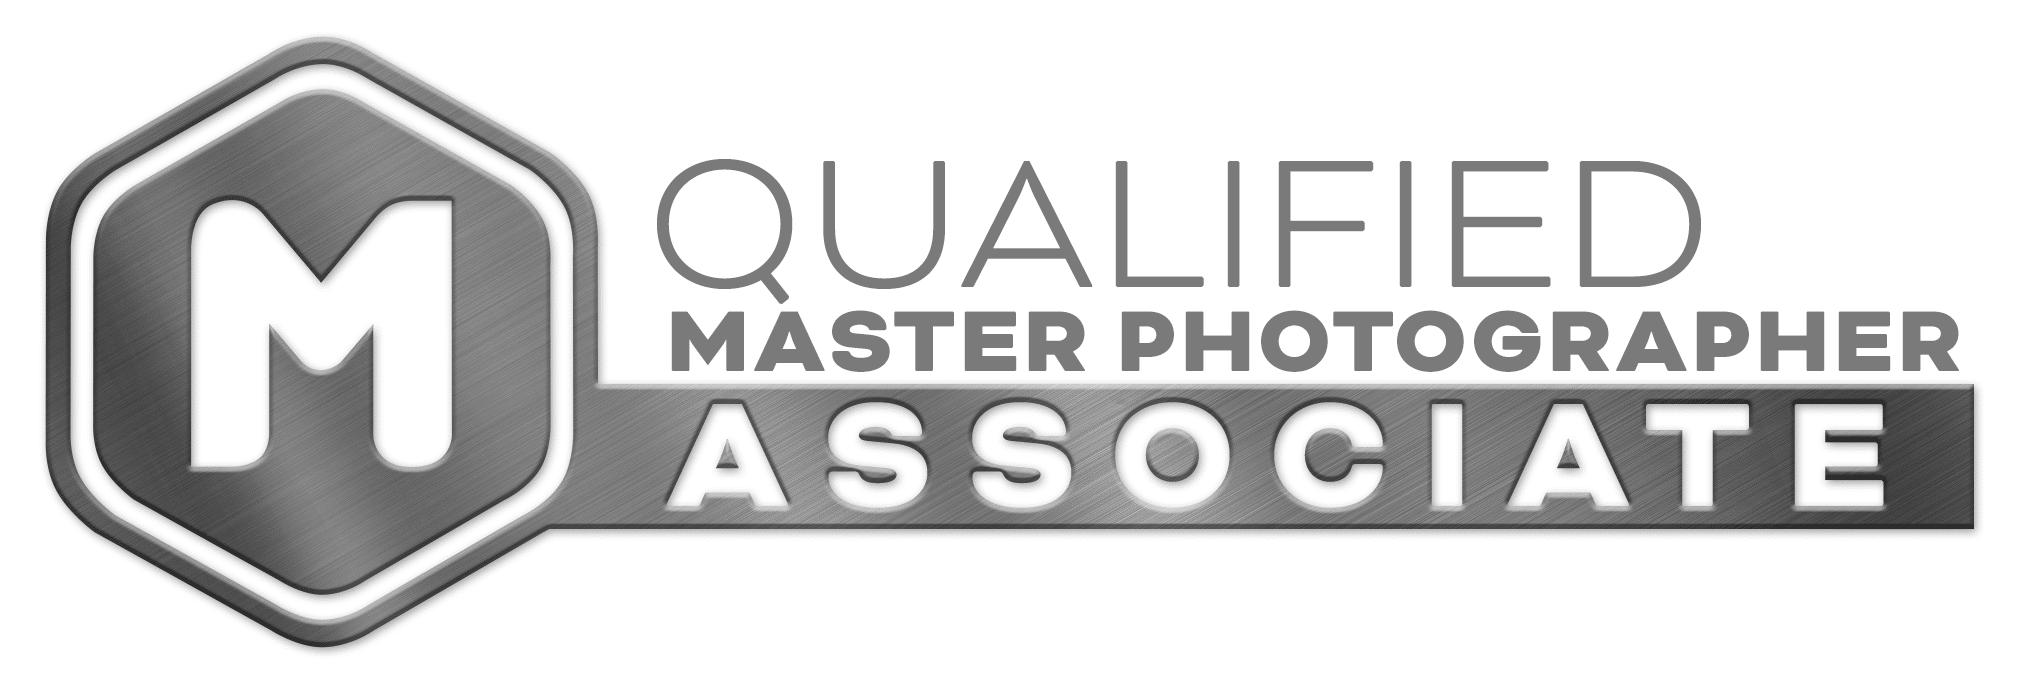 MPA logo Associate